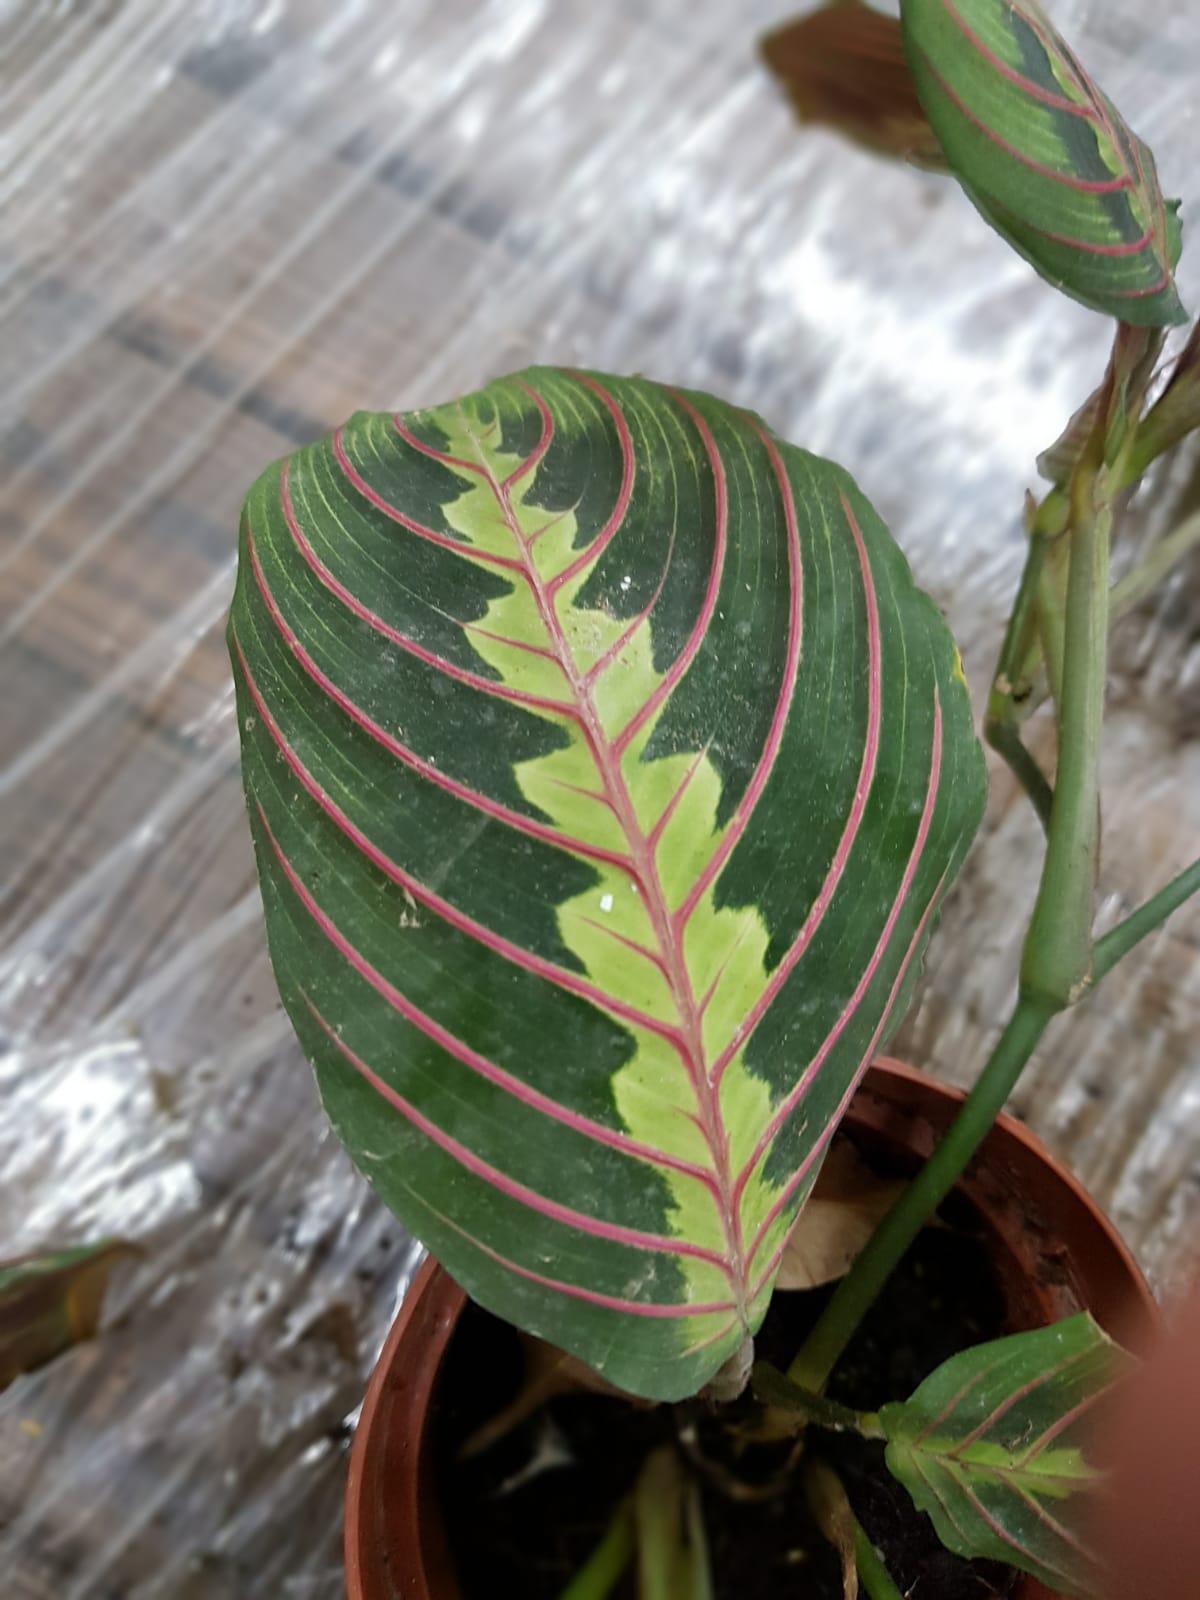 Maranta Leuconeura 'Indoor Plants Shrubs